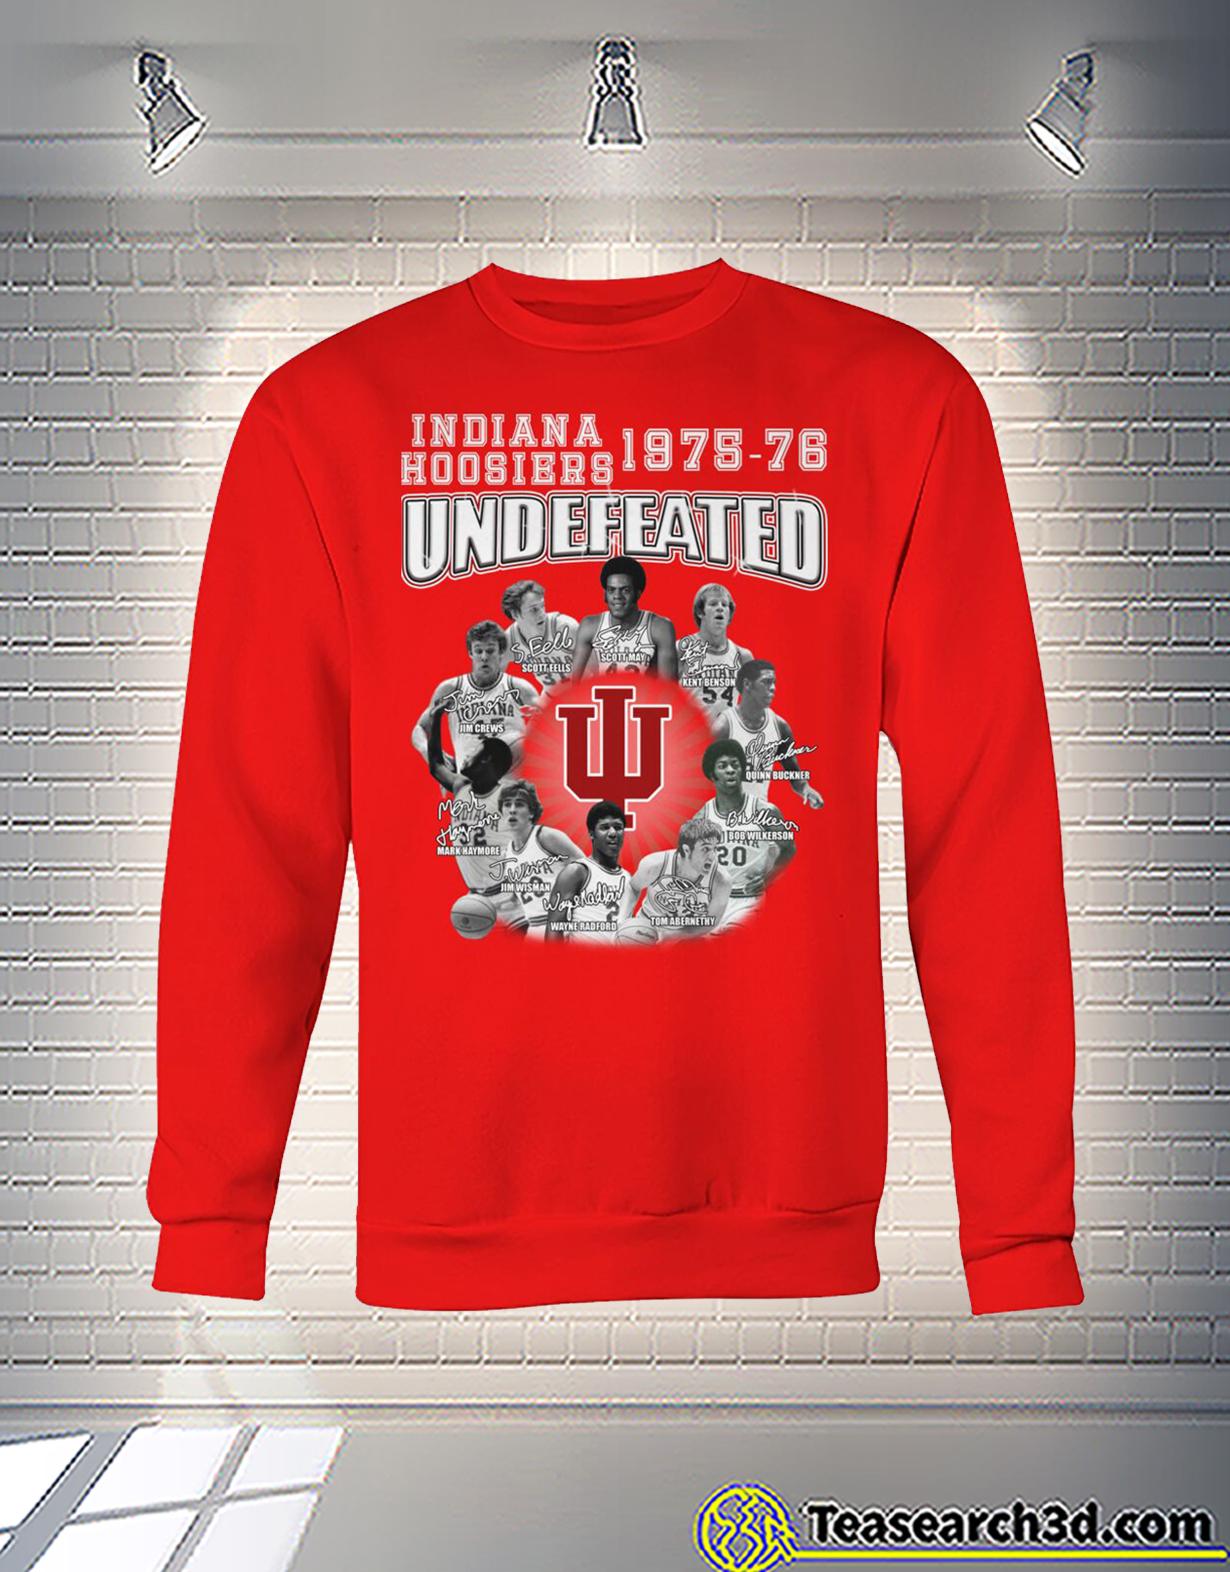 Indiana hoosiers 1975-76 undefeated players signature sweatshirt